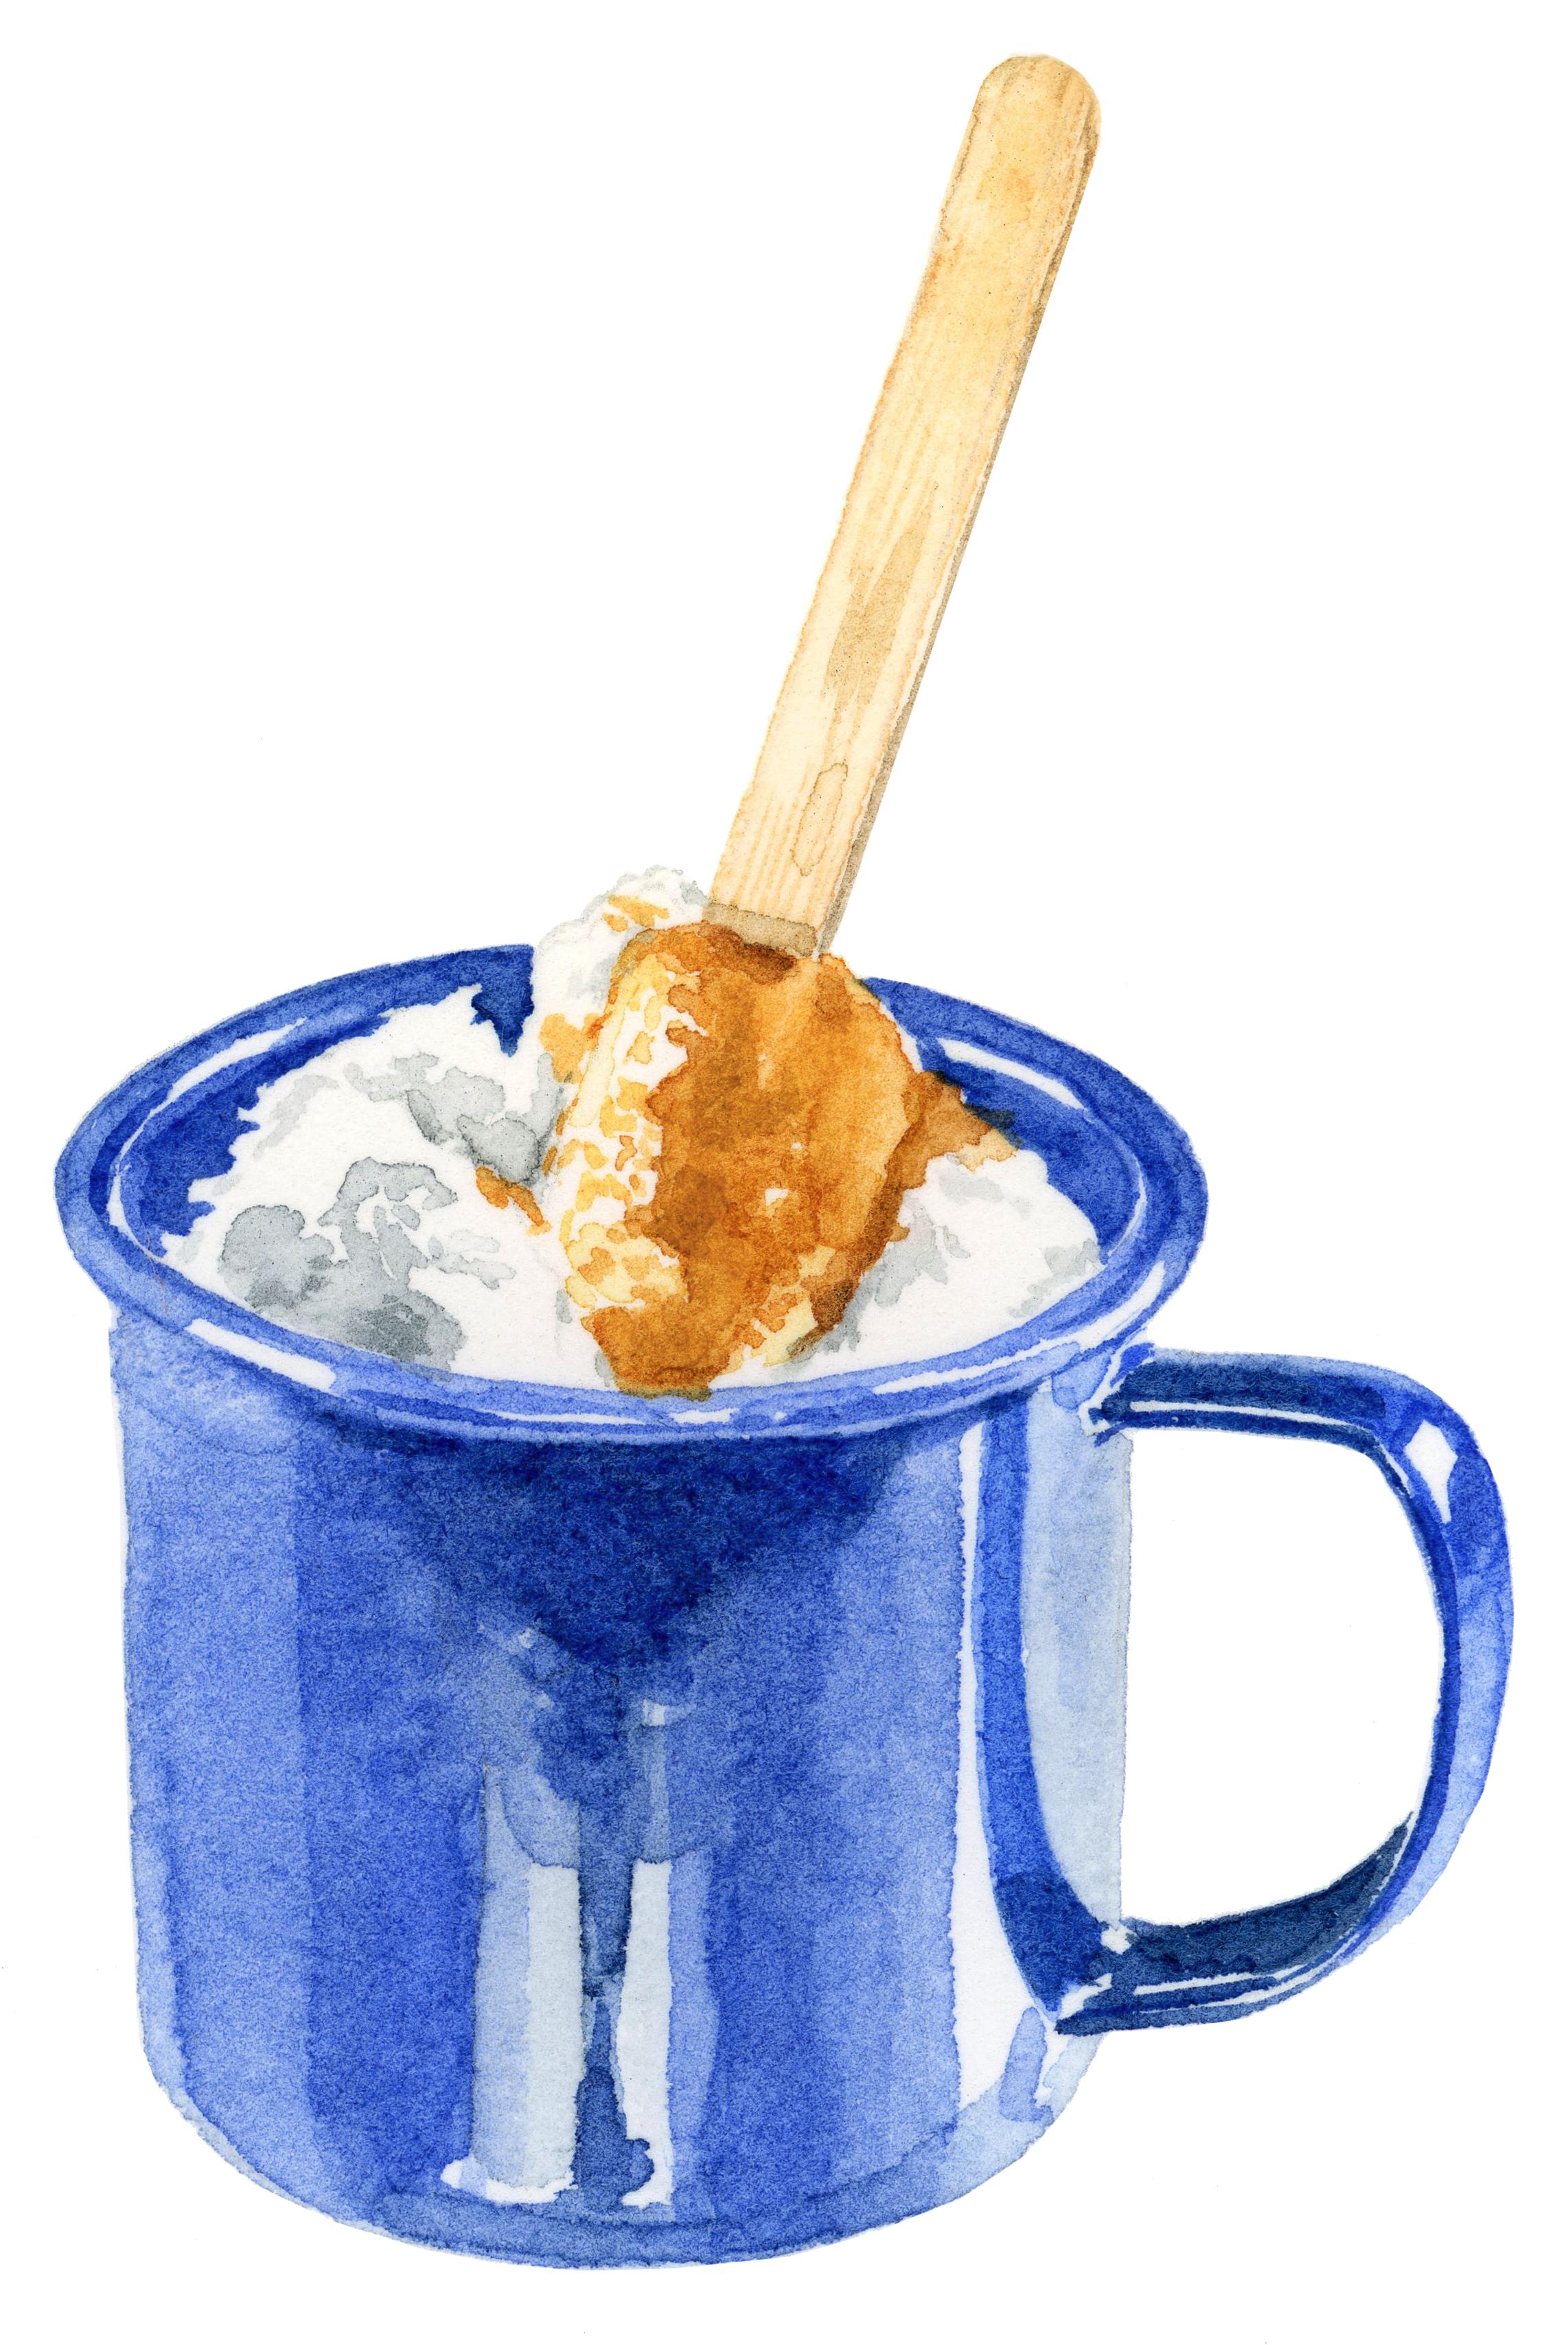 maple-sugar-lrg.jpg